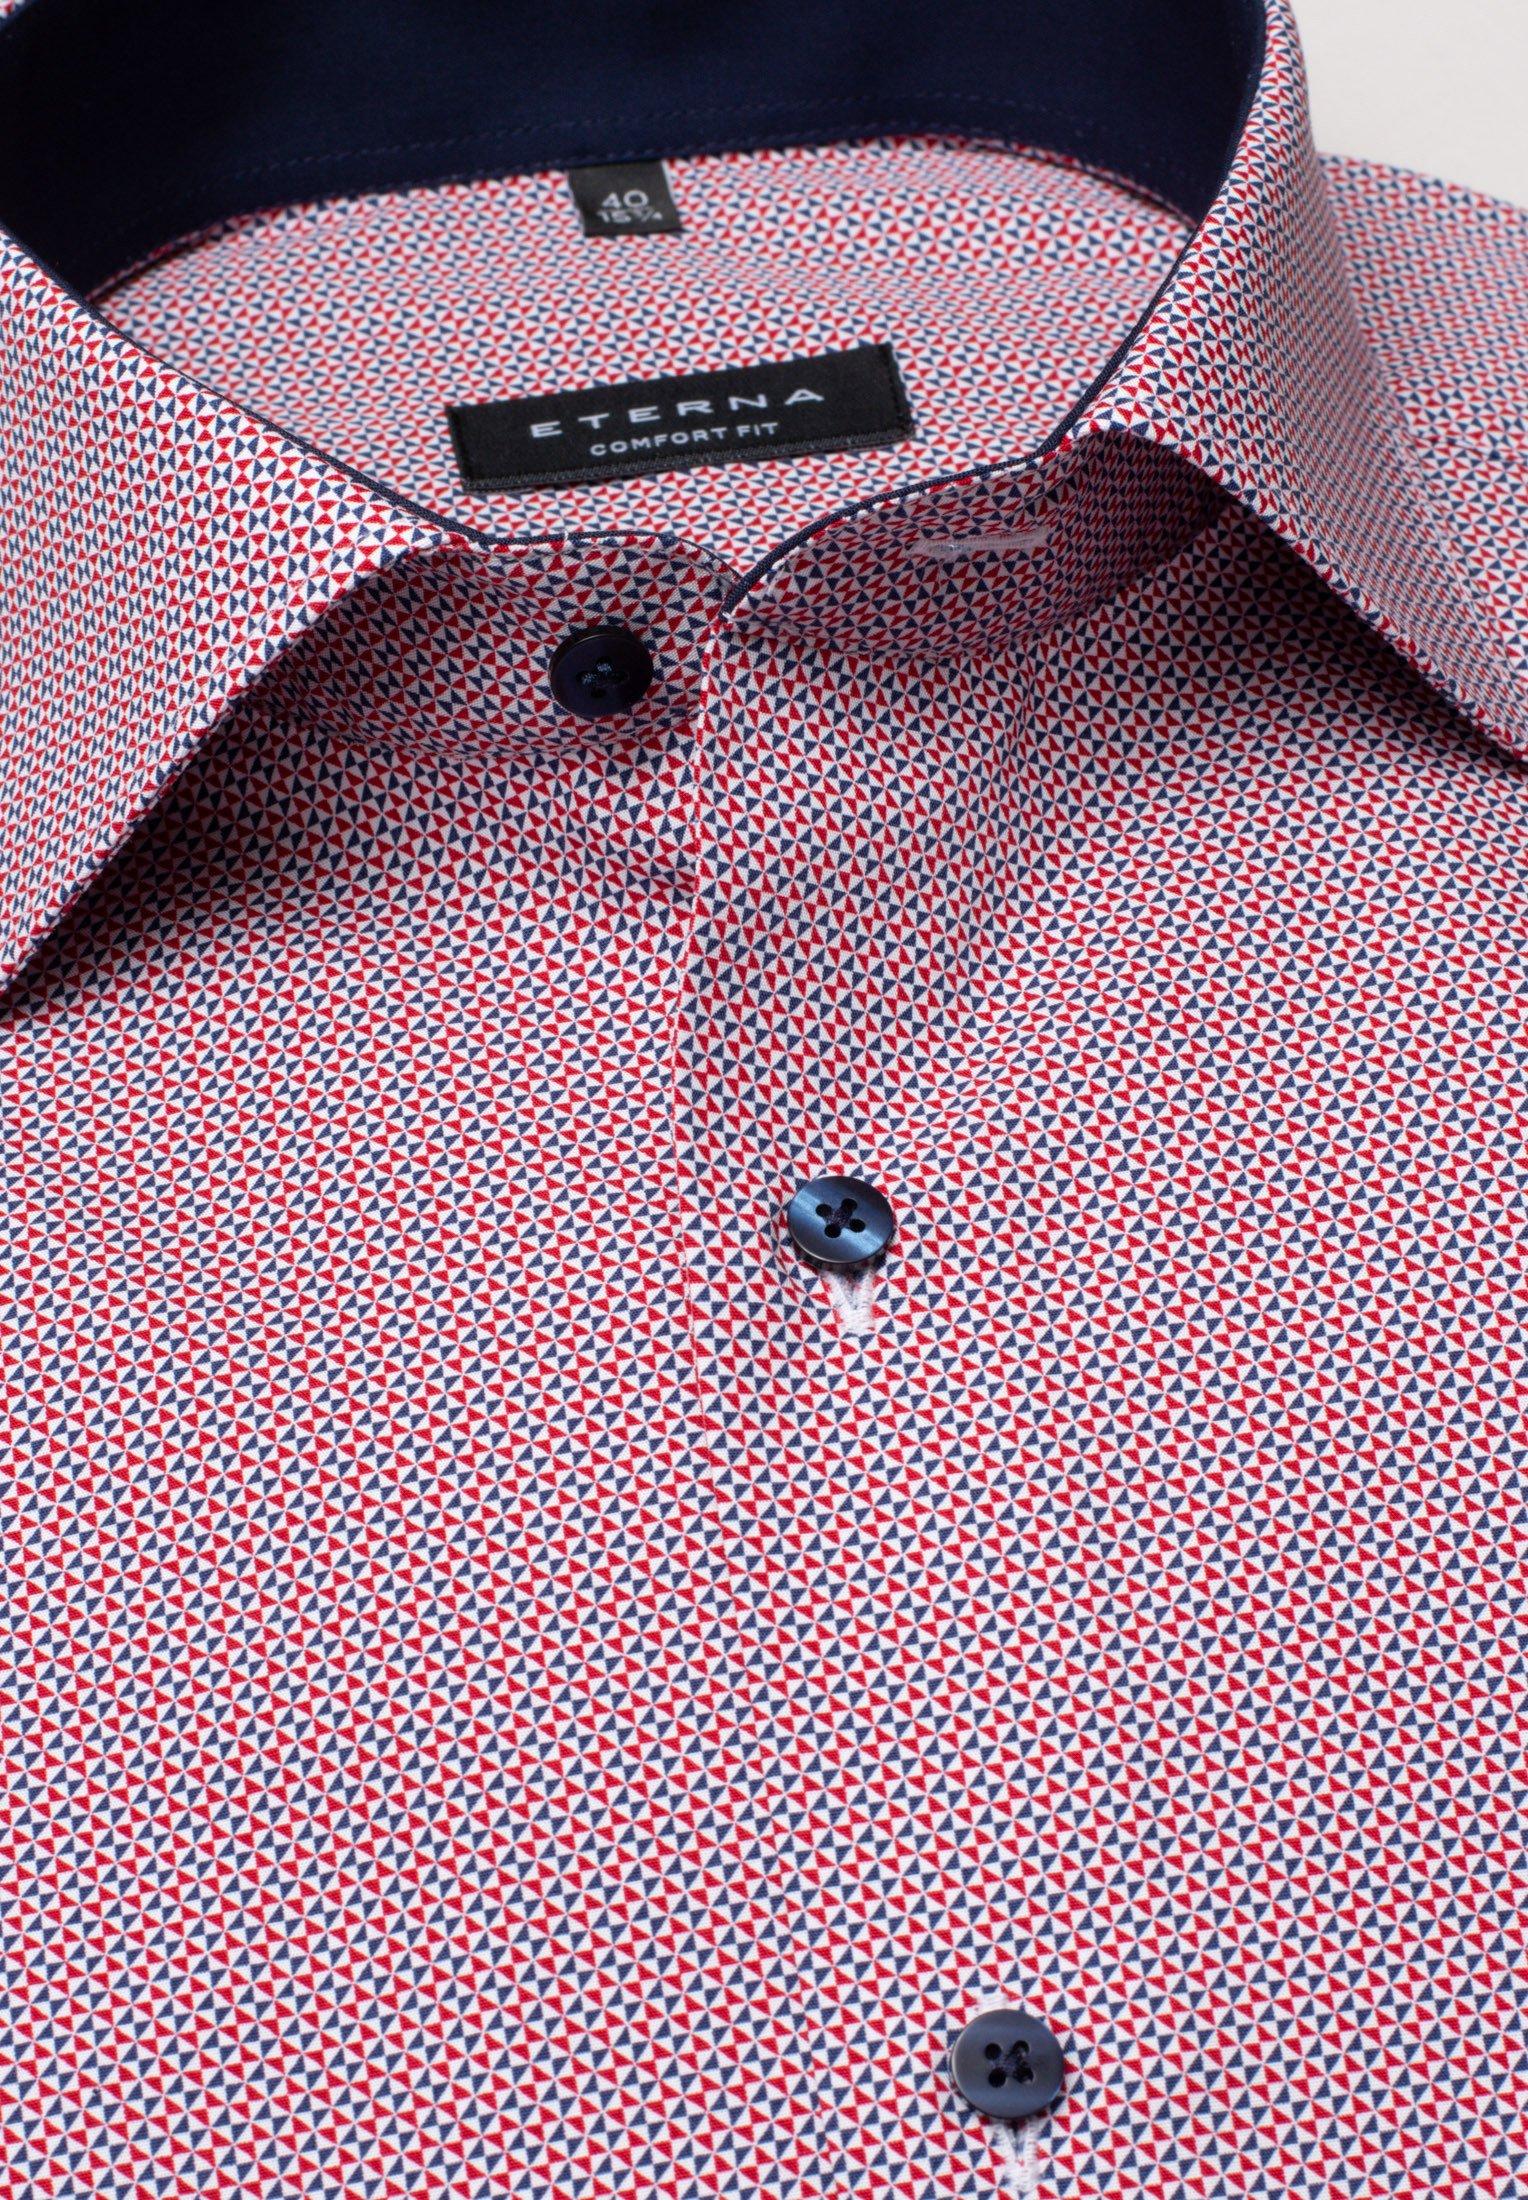 Eterna COMFORT FIT - Chemise - pink